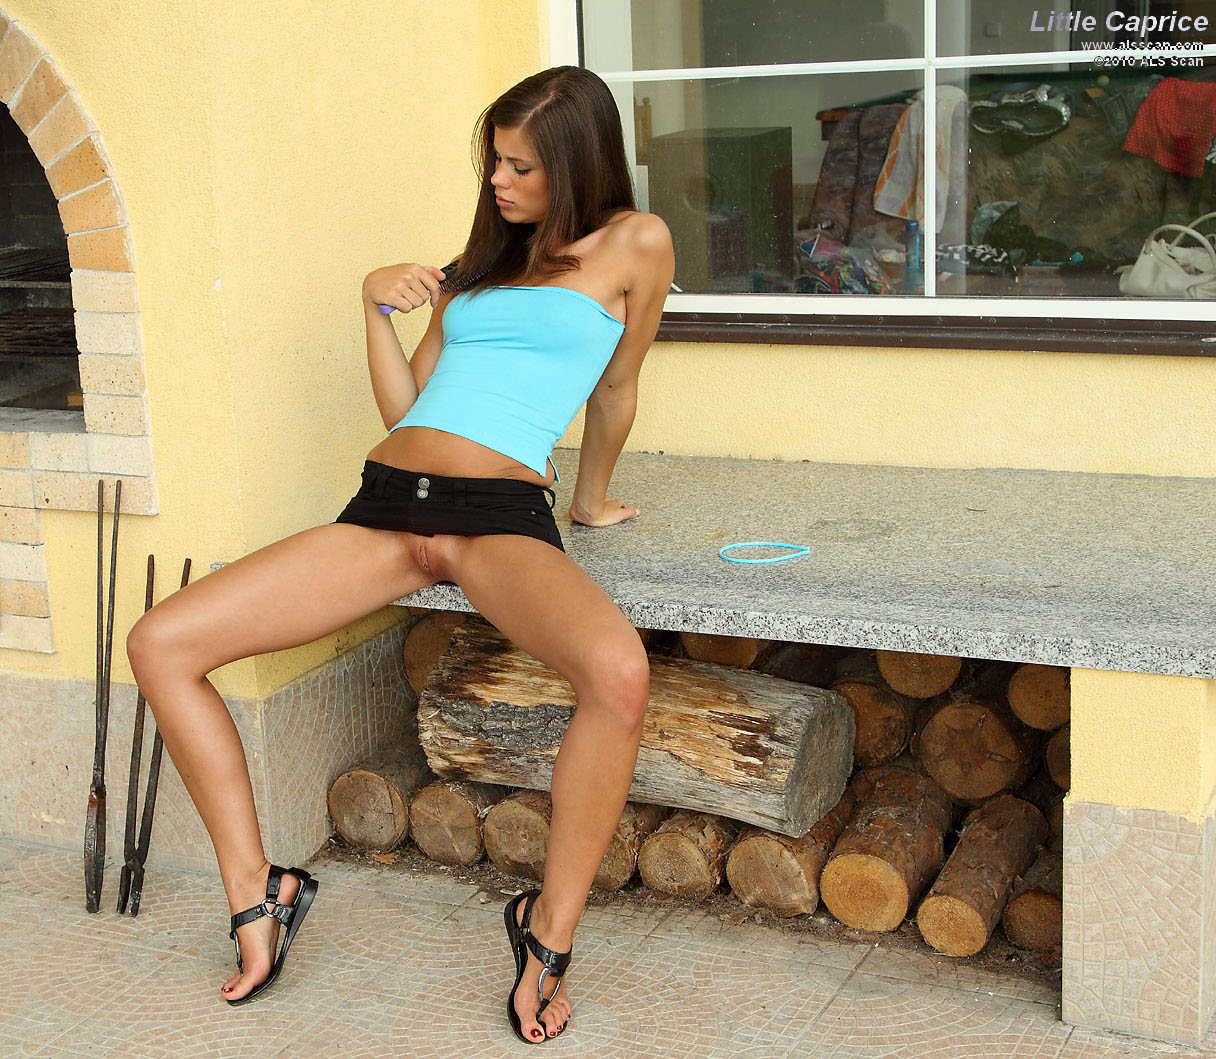 als upskirt - Long legged teen brunette with shaved tight pussy strips off her black mini  skirt